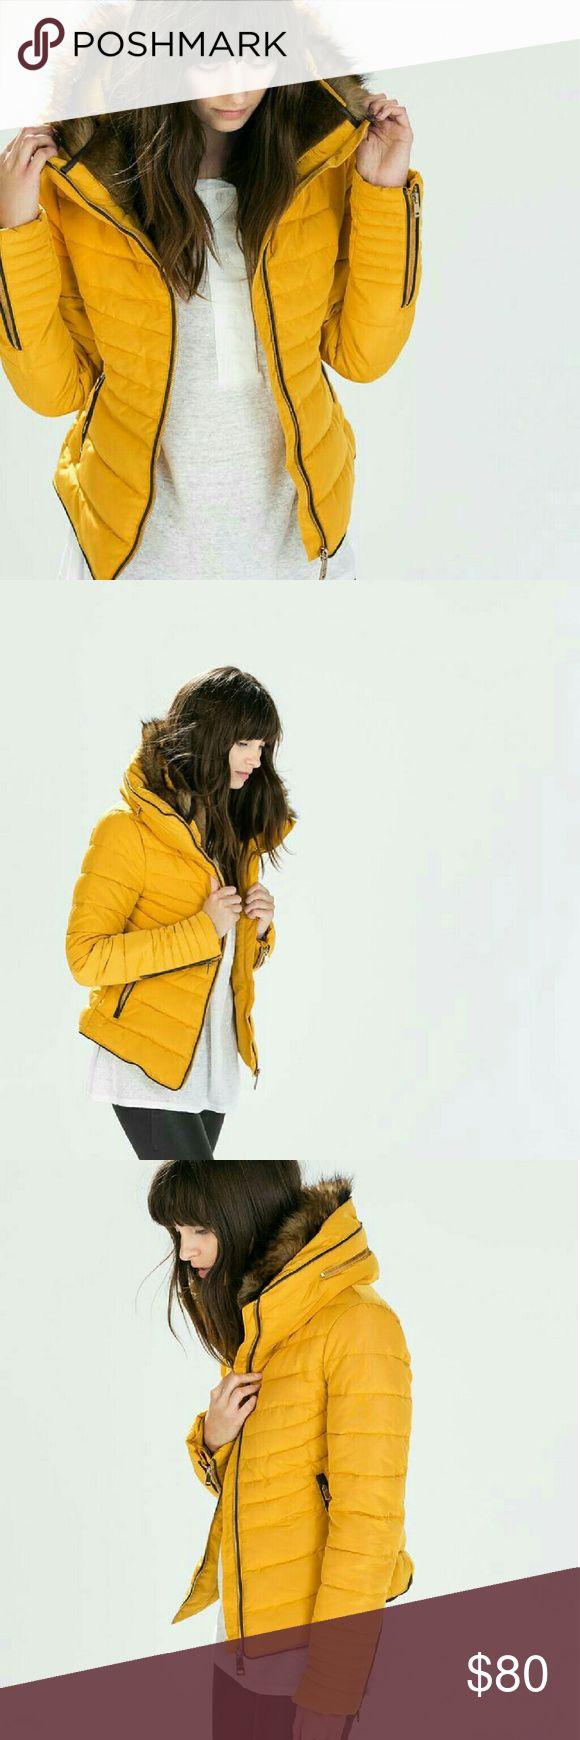 PRICE DROPEnds Tonight! ZARA ZARA Puffer Jacket. Has hidden hoodie inside zipper compartment. Zara Jackets & Coats Puffers